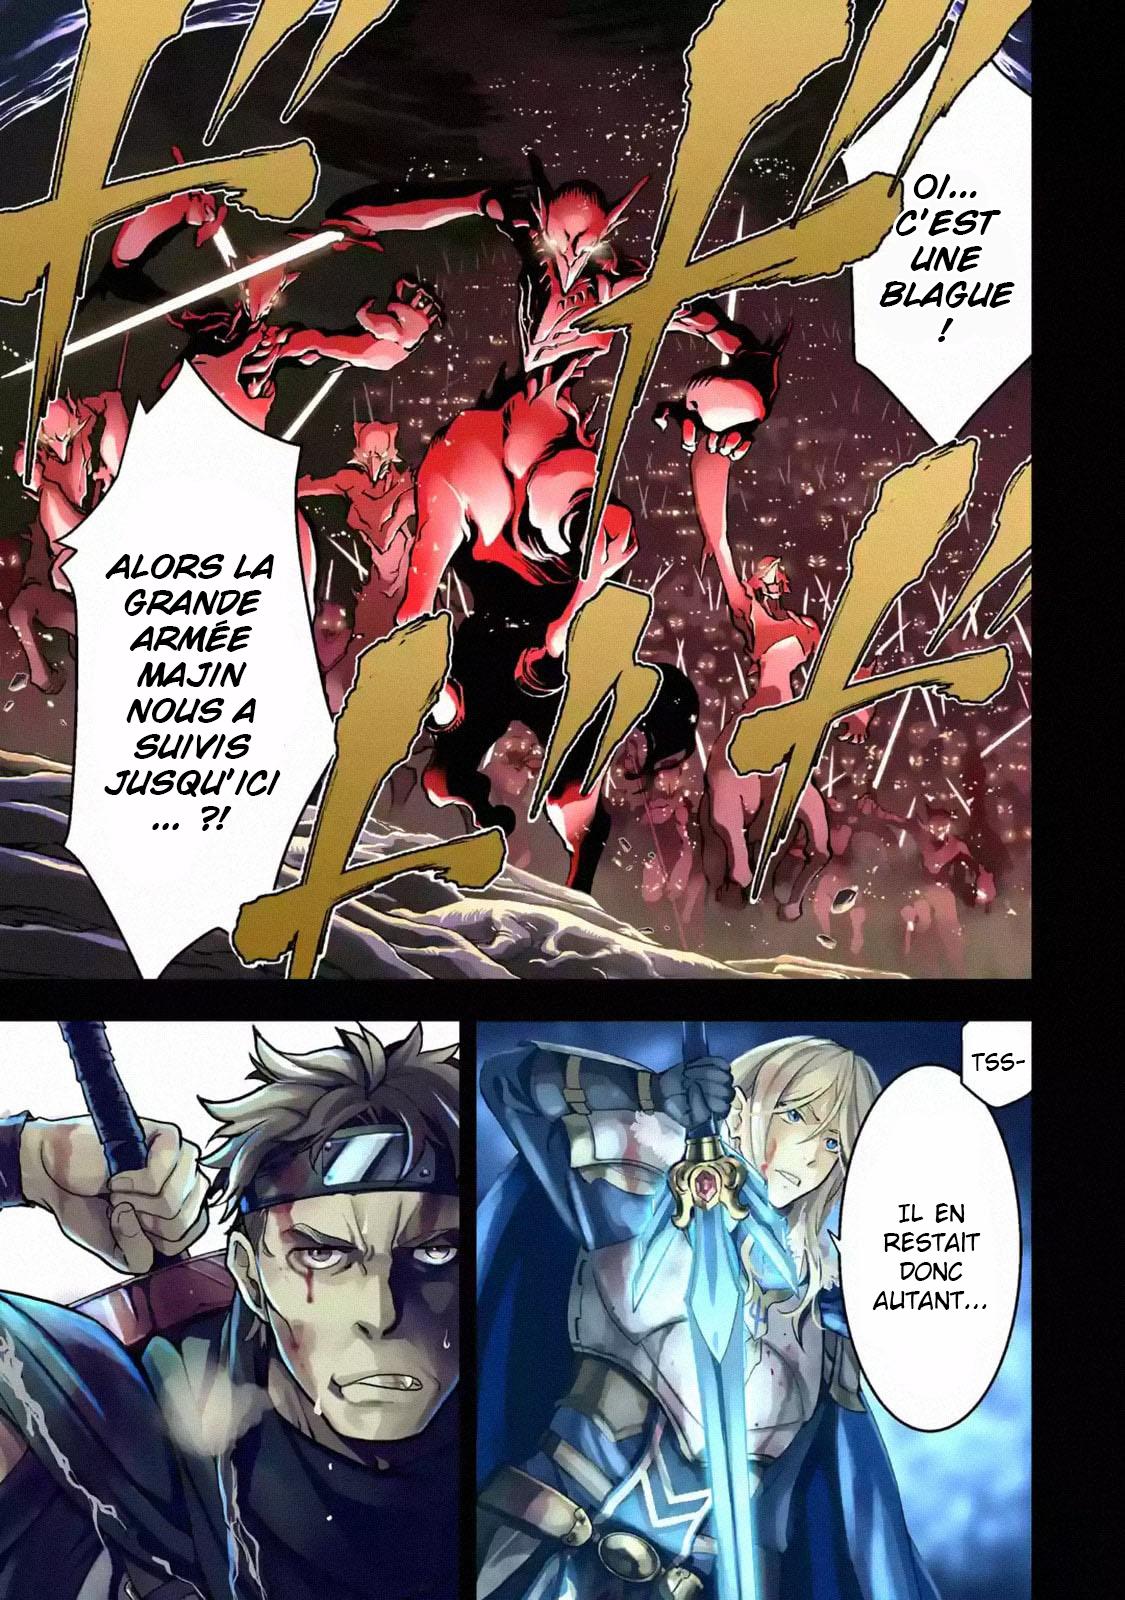 https://nine.mangadogs.com/fr_manga/pic2/49/8369/349149/f90503d430452da9236bffac39001e1a.jpg Page 6